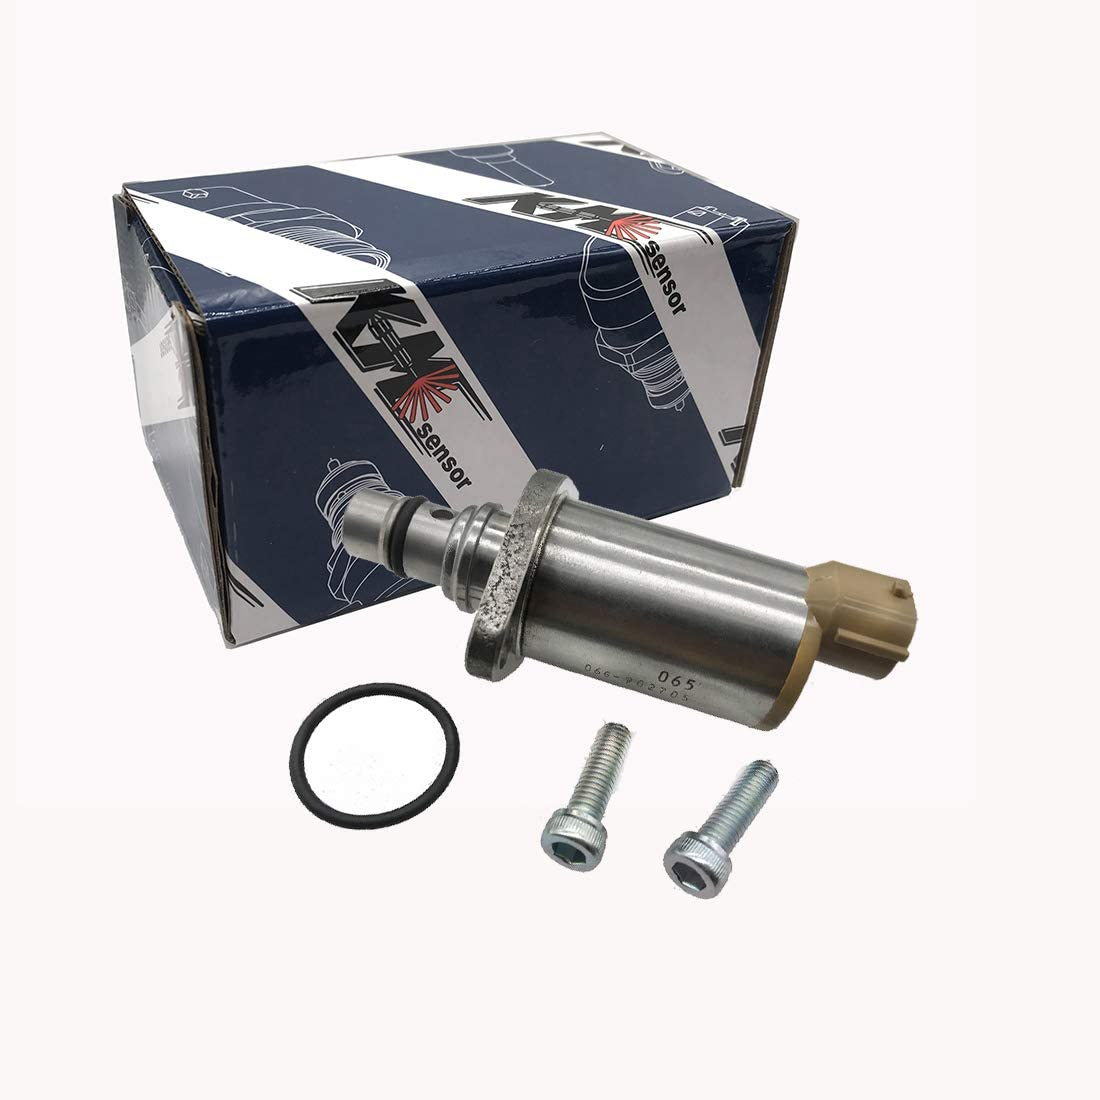 kmdiesel brand 294200-0650 Diesel Max 81% OFF Fuel Suc Pump Max 46% OFF sensor Regulator